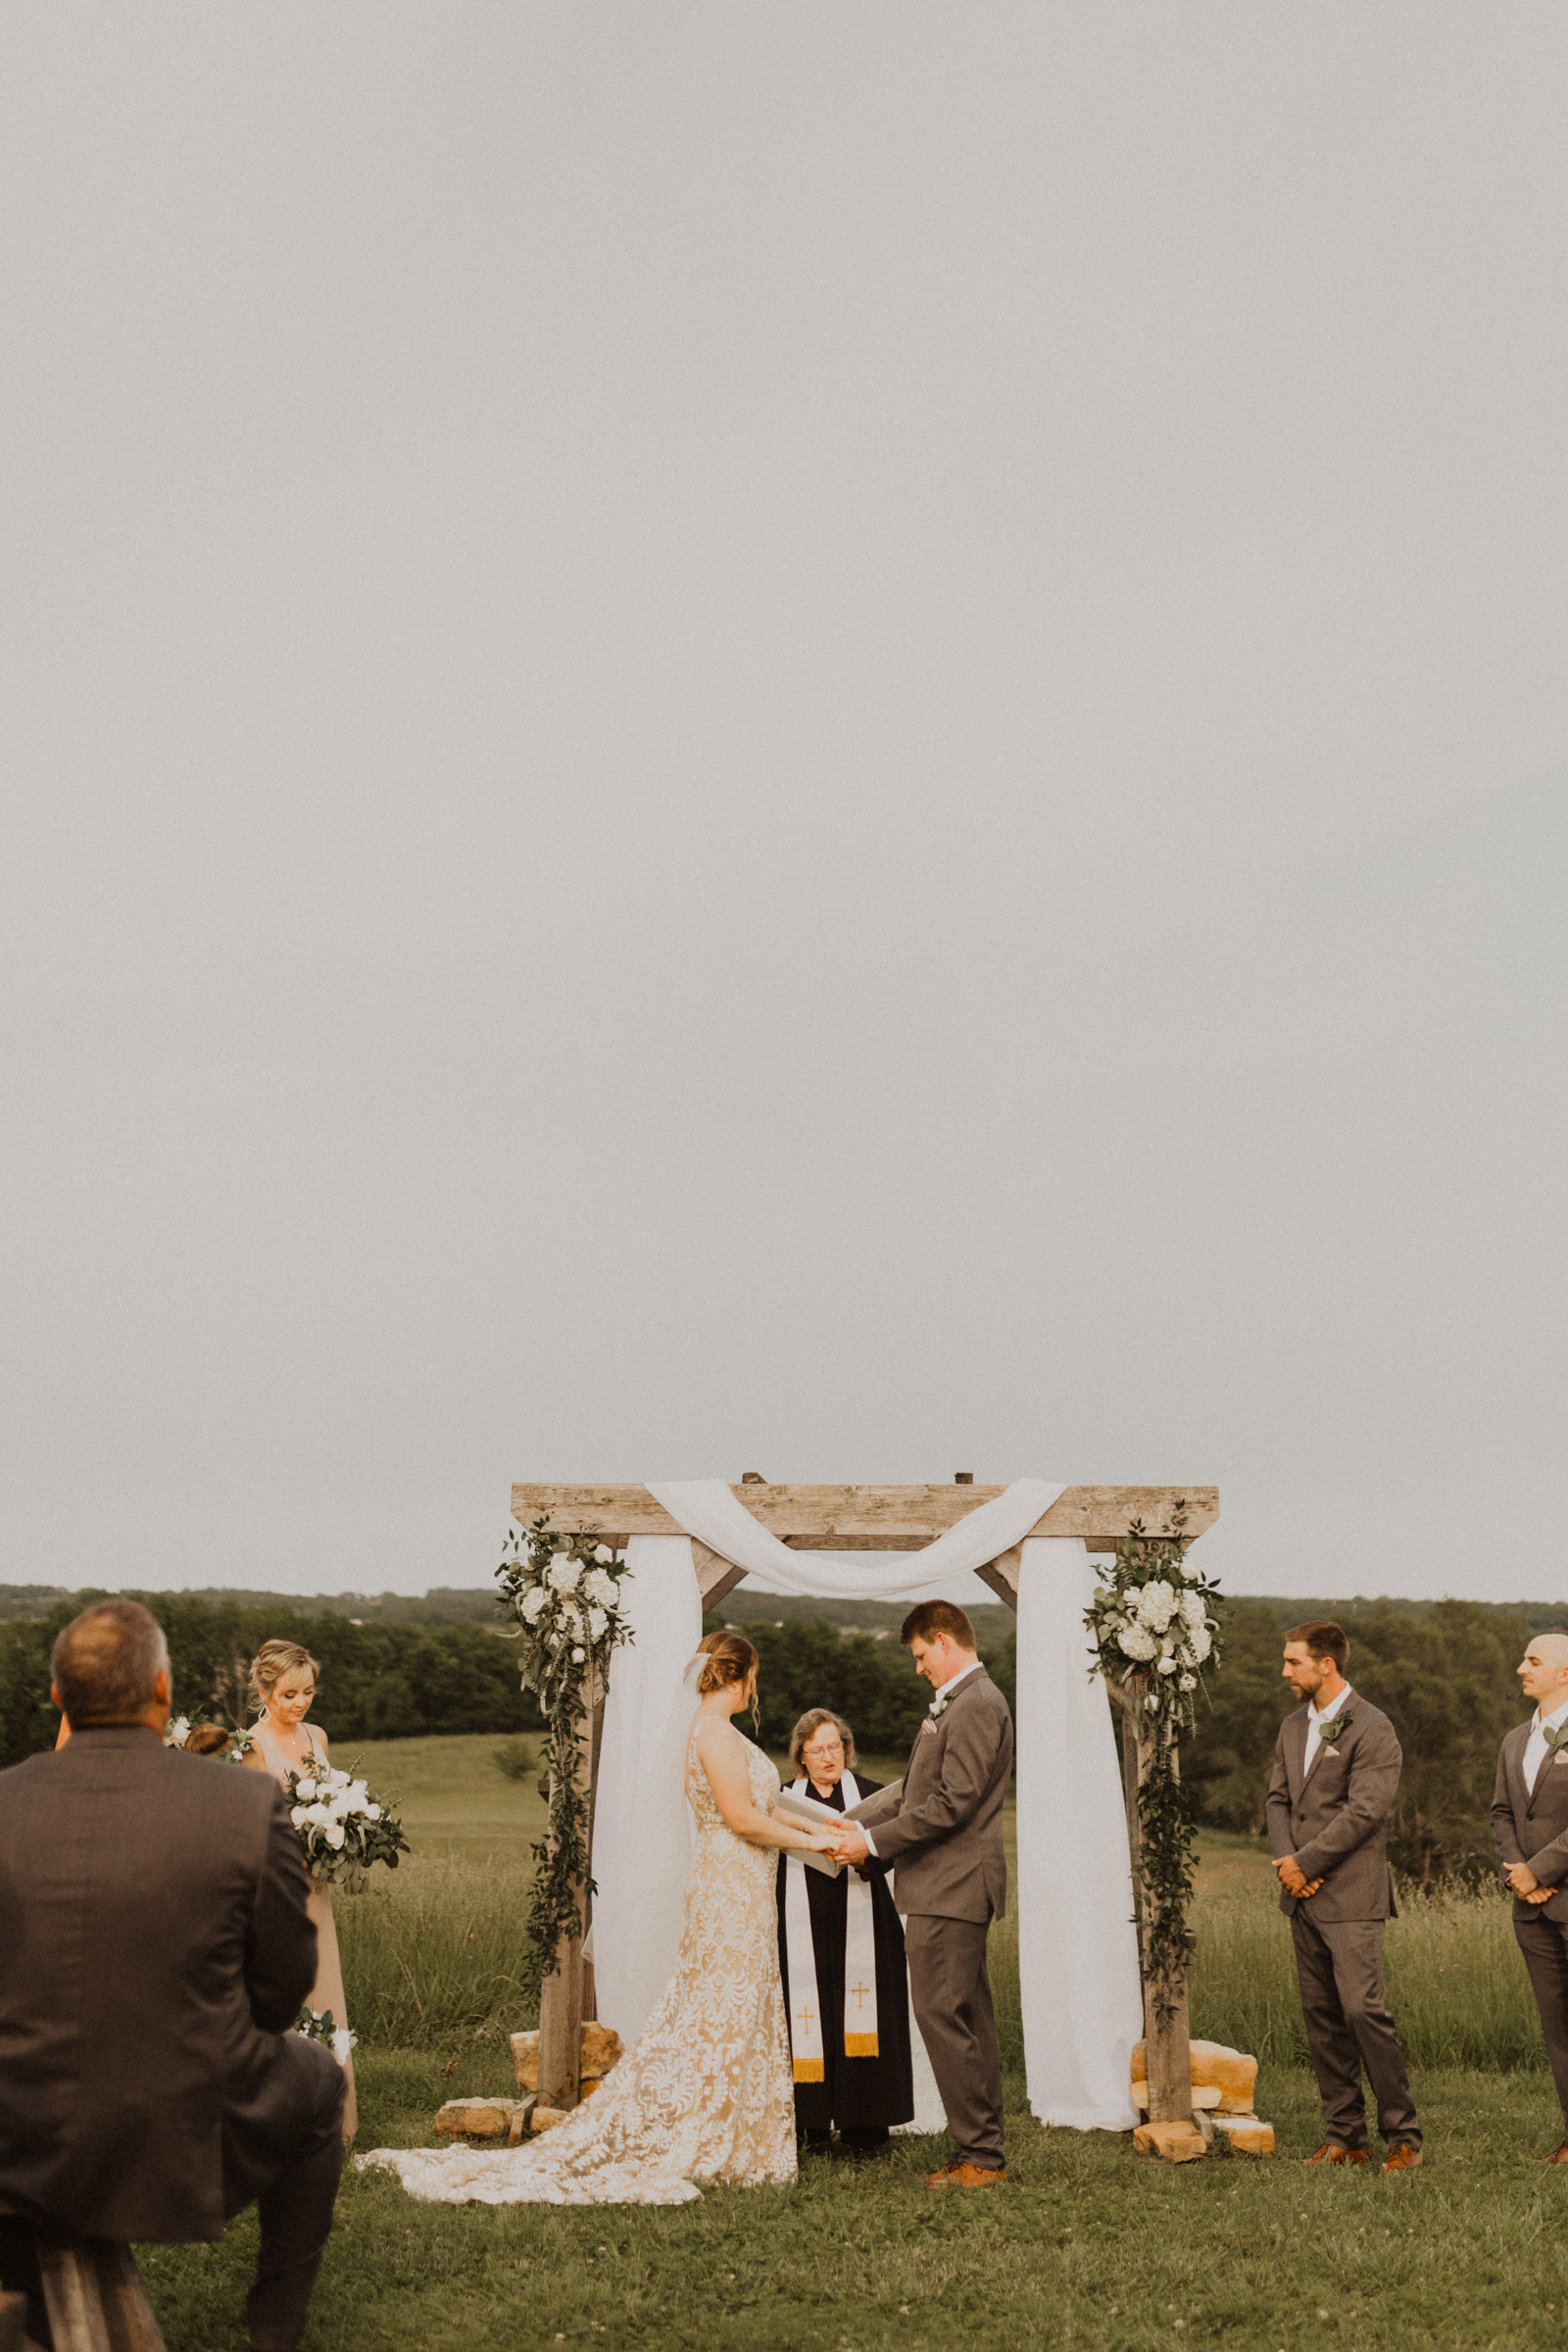 alyssa barletter photography weston red barn farm timberbarn summer outdoor wedding-45.jpg